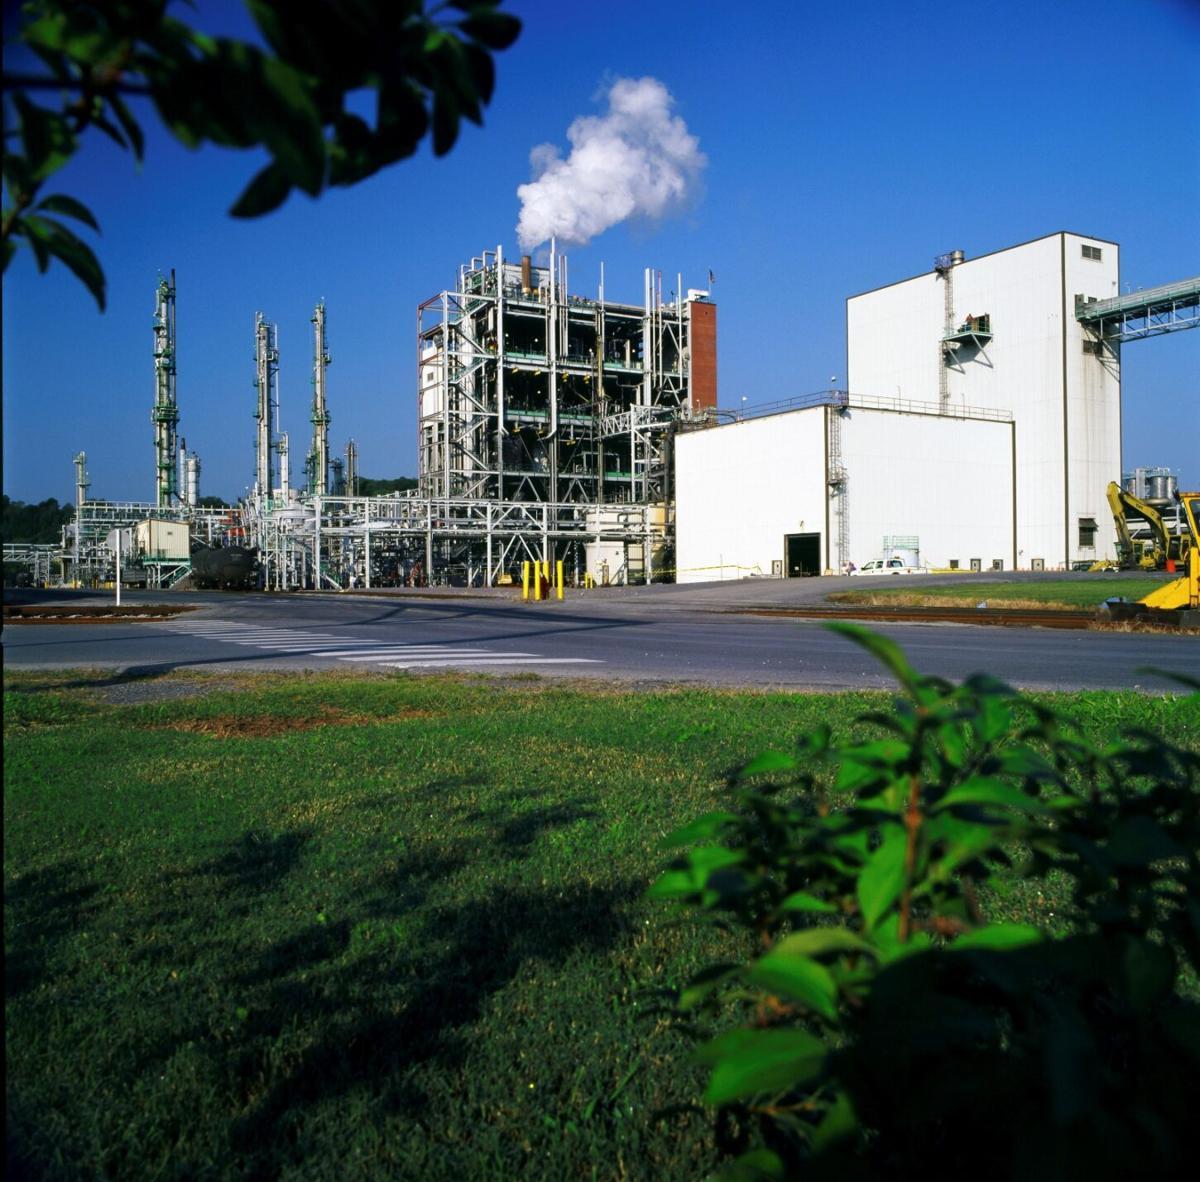 Eastman coal gasification facility